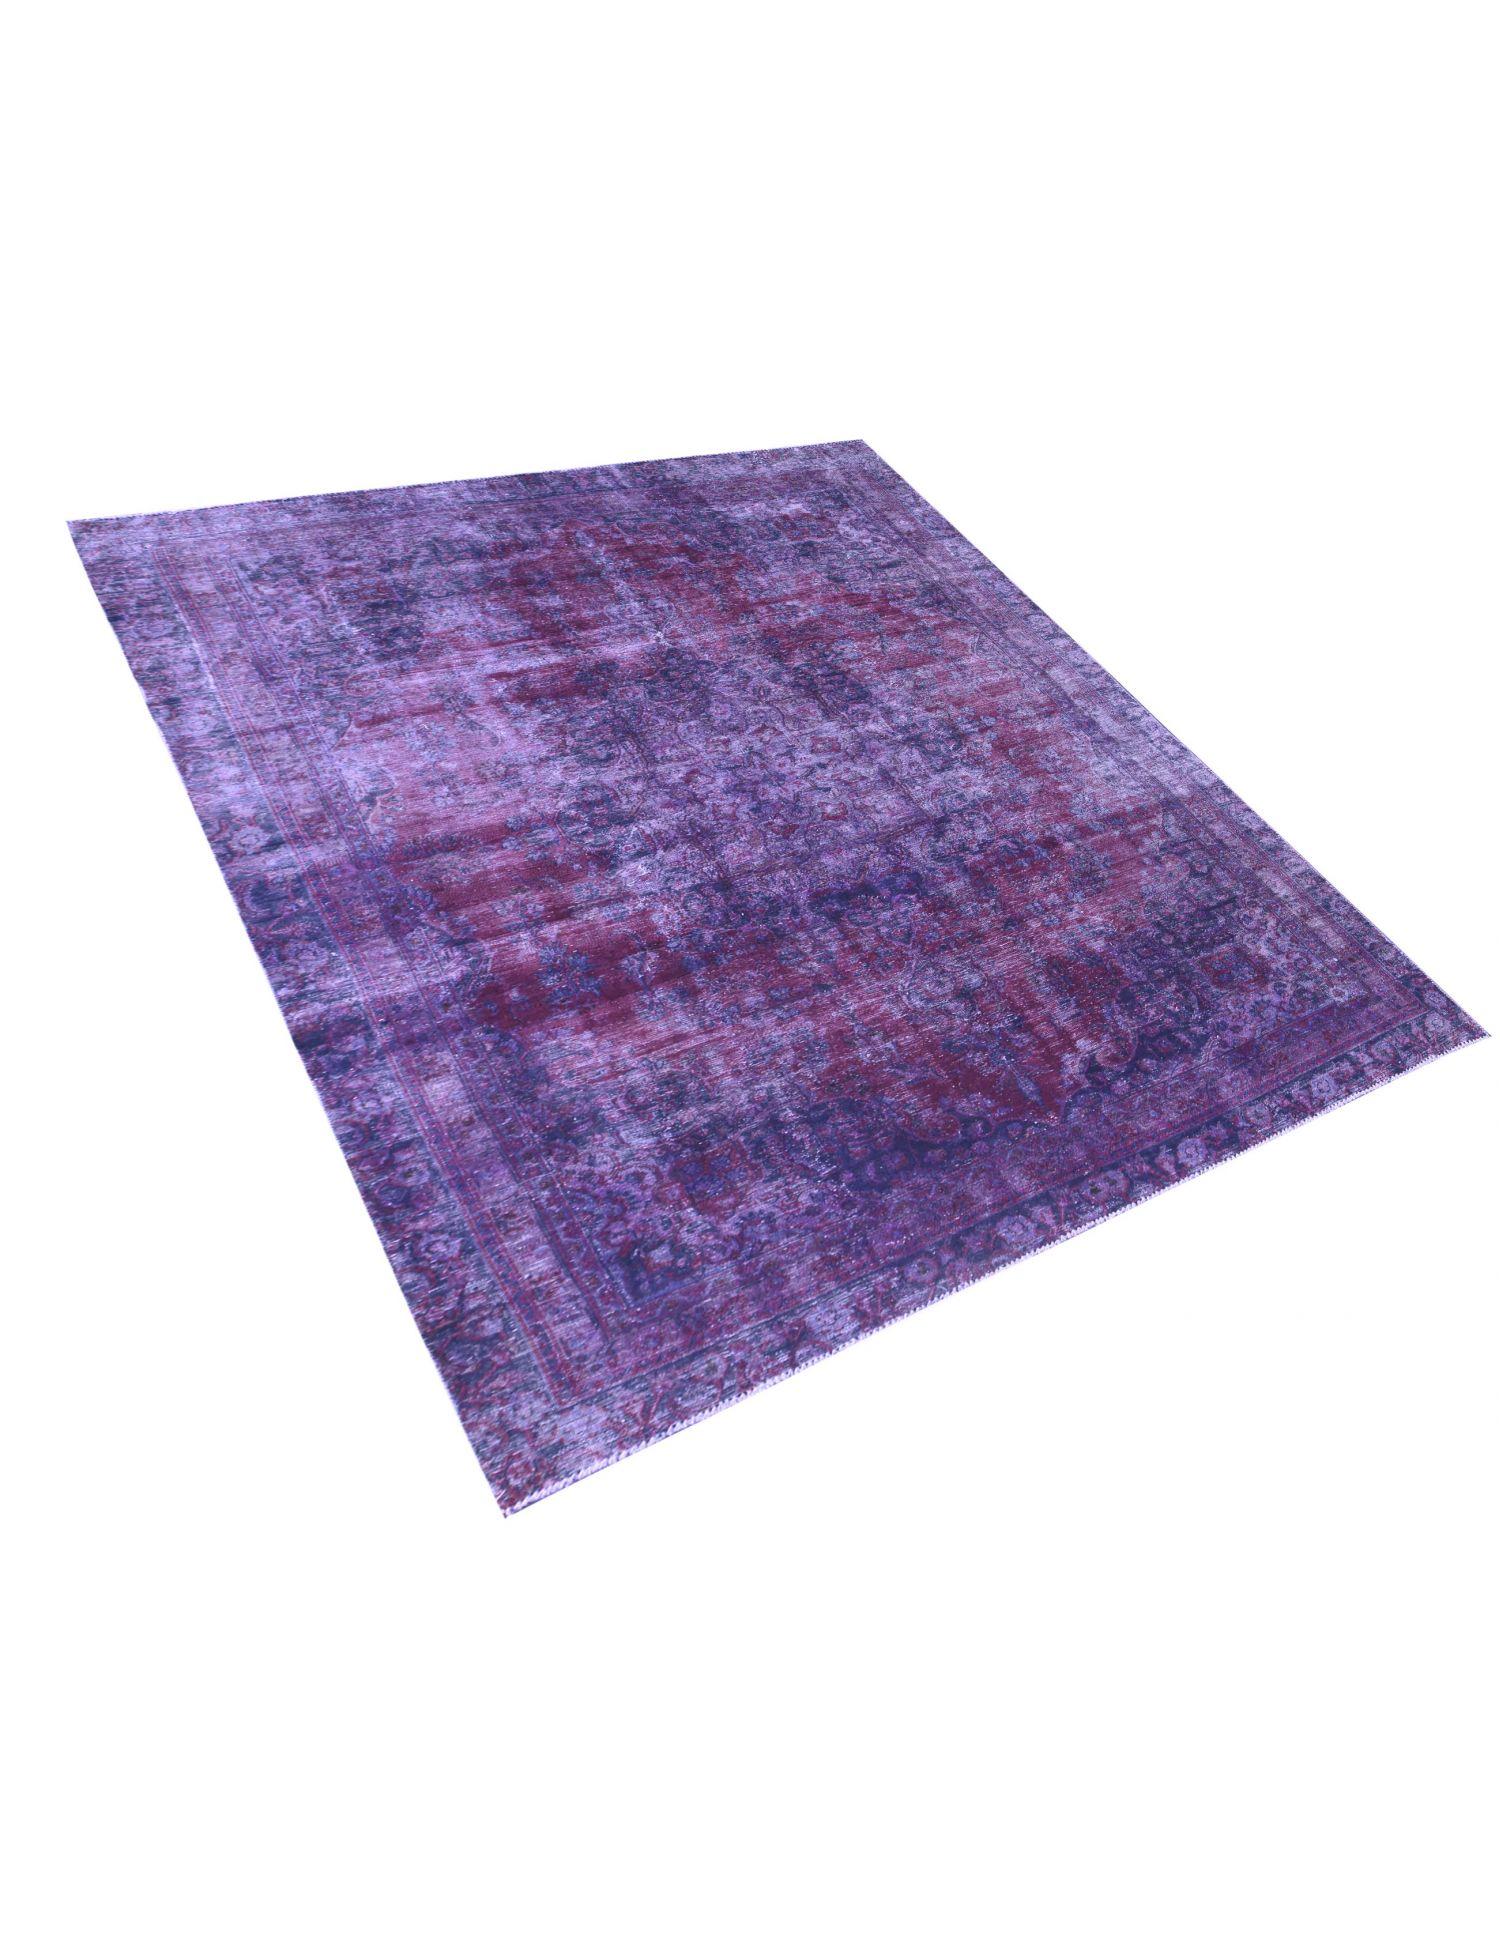 Vintage Teppich  lila <br/>324 x 238 cm